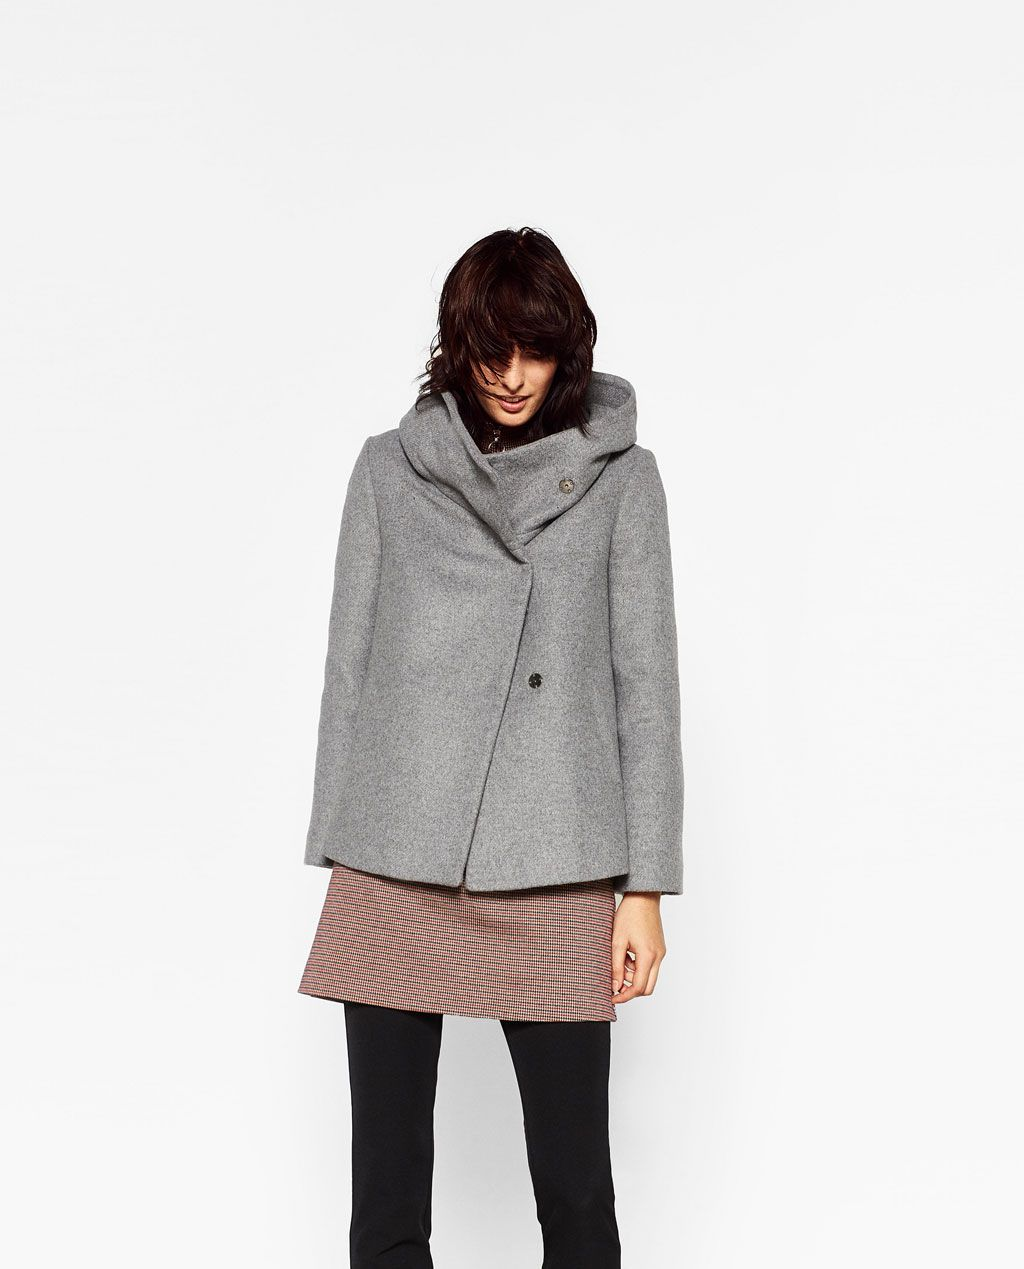 f0ae22343ef0 ABRIGO CORTO CUELLO ENVOLVENTE en 2019 | Moda Mujer | Ropa de abrigo ...